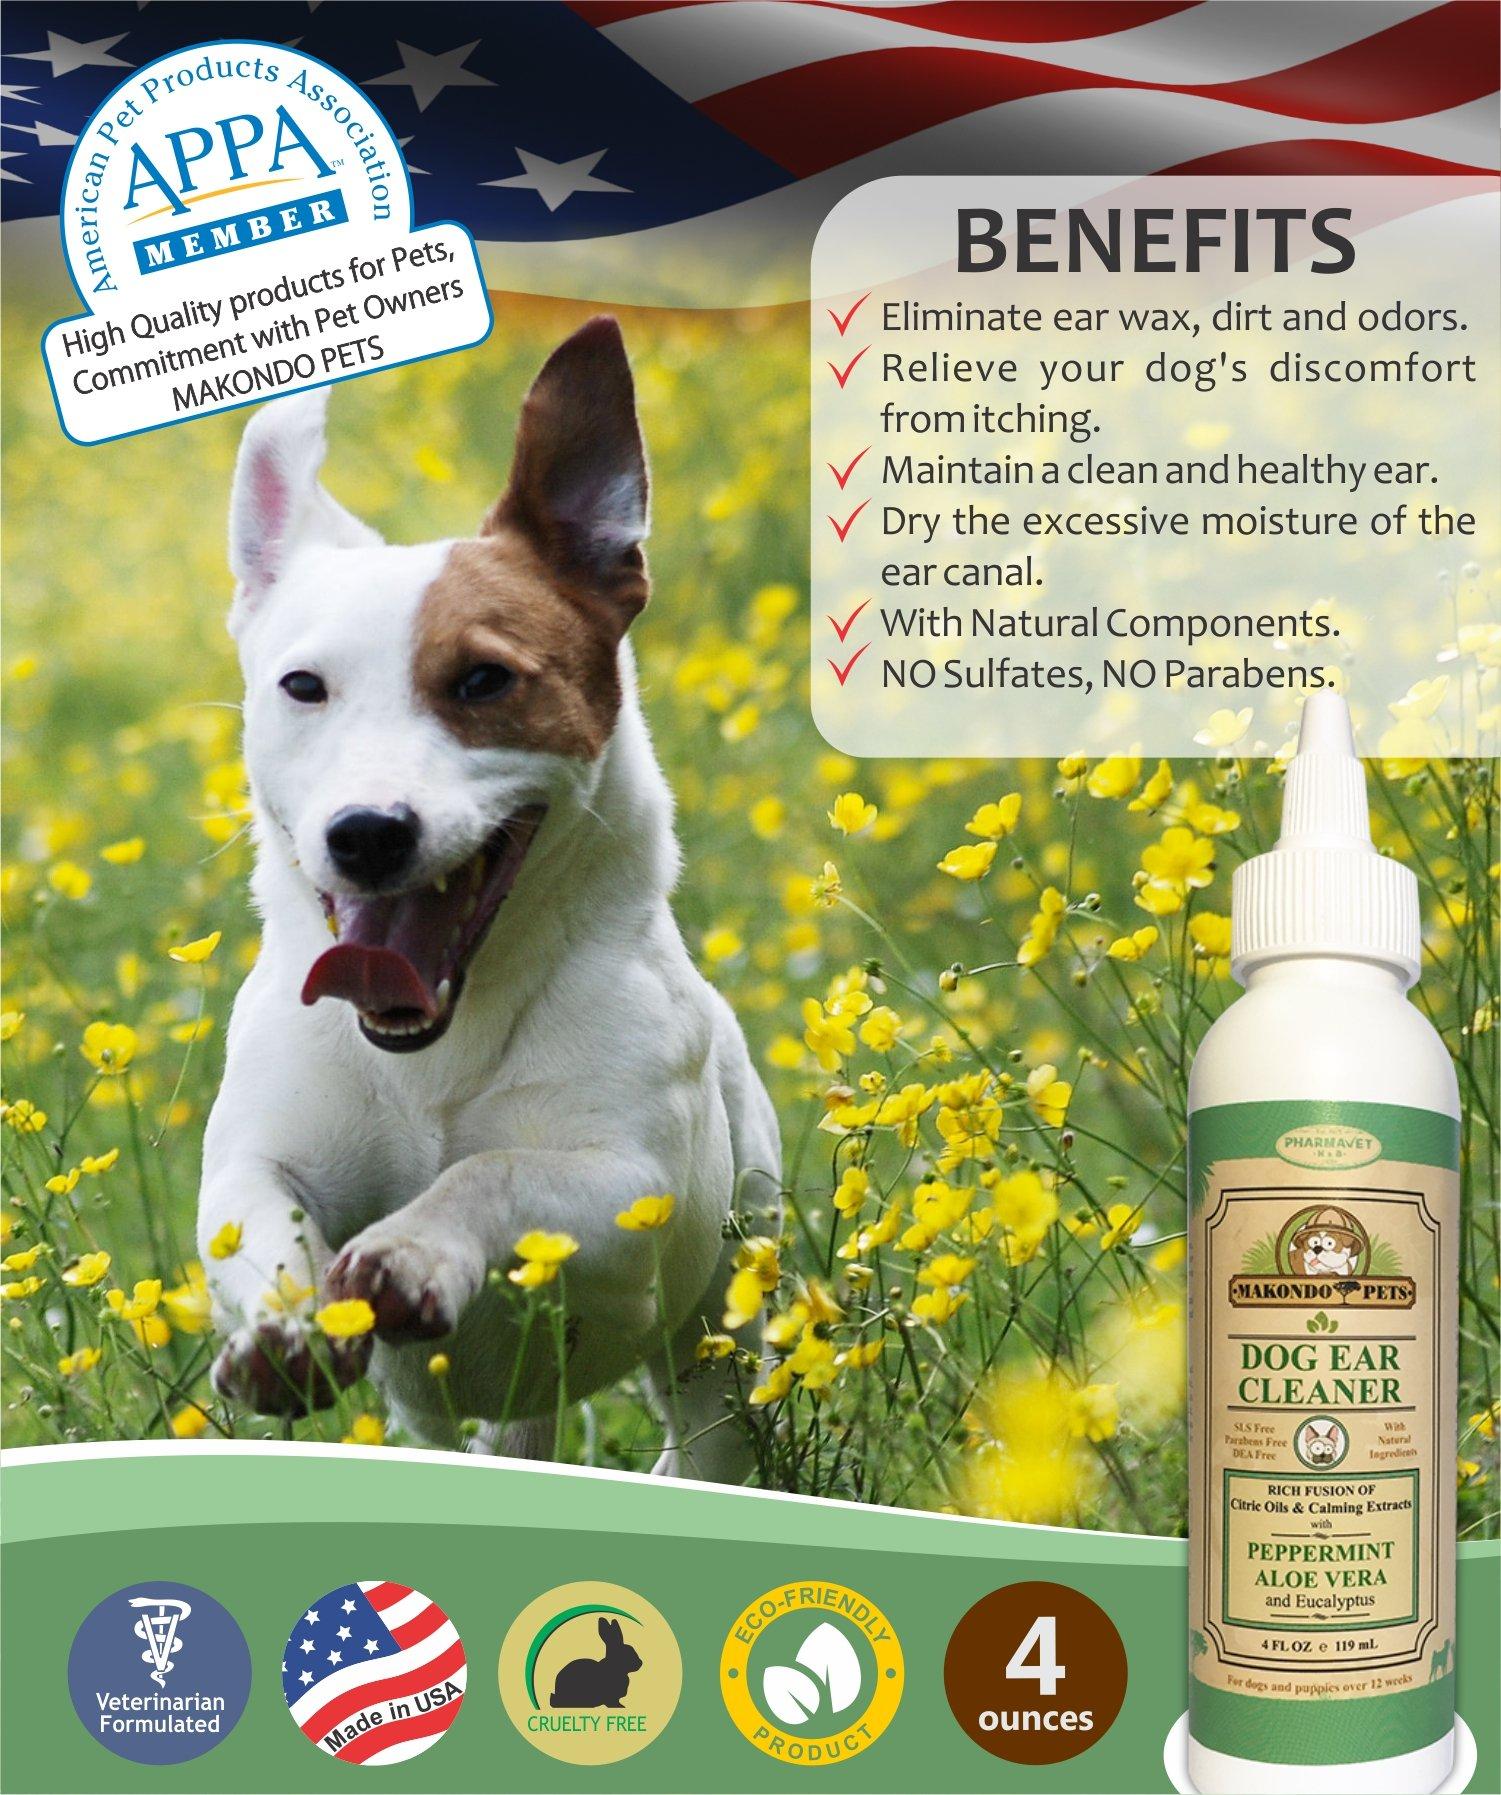 Buy Makondo Pets Dog Ear Cleaner/Advanced Dog Ear Wax Remover- All